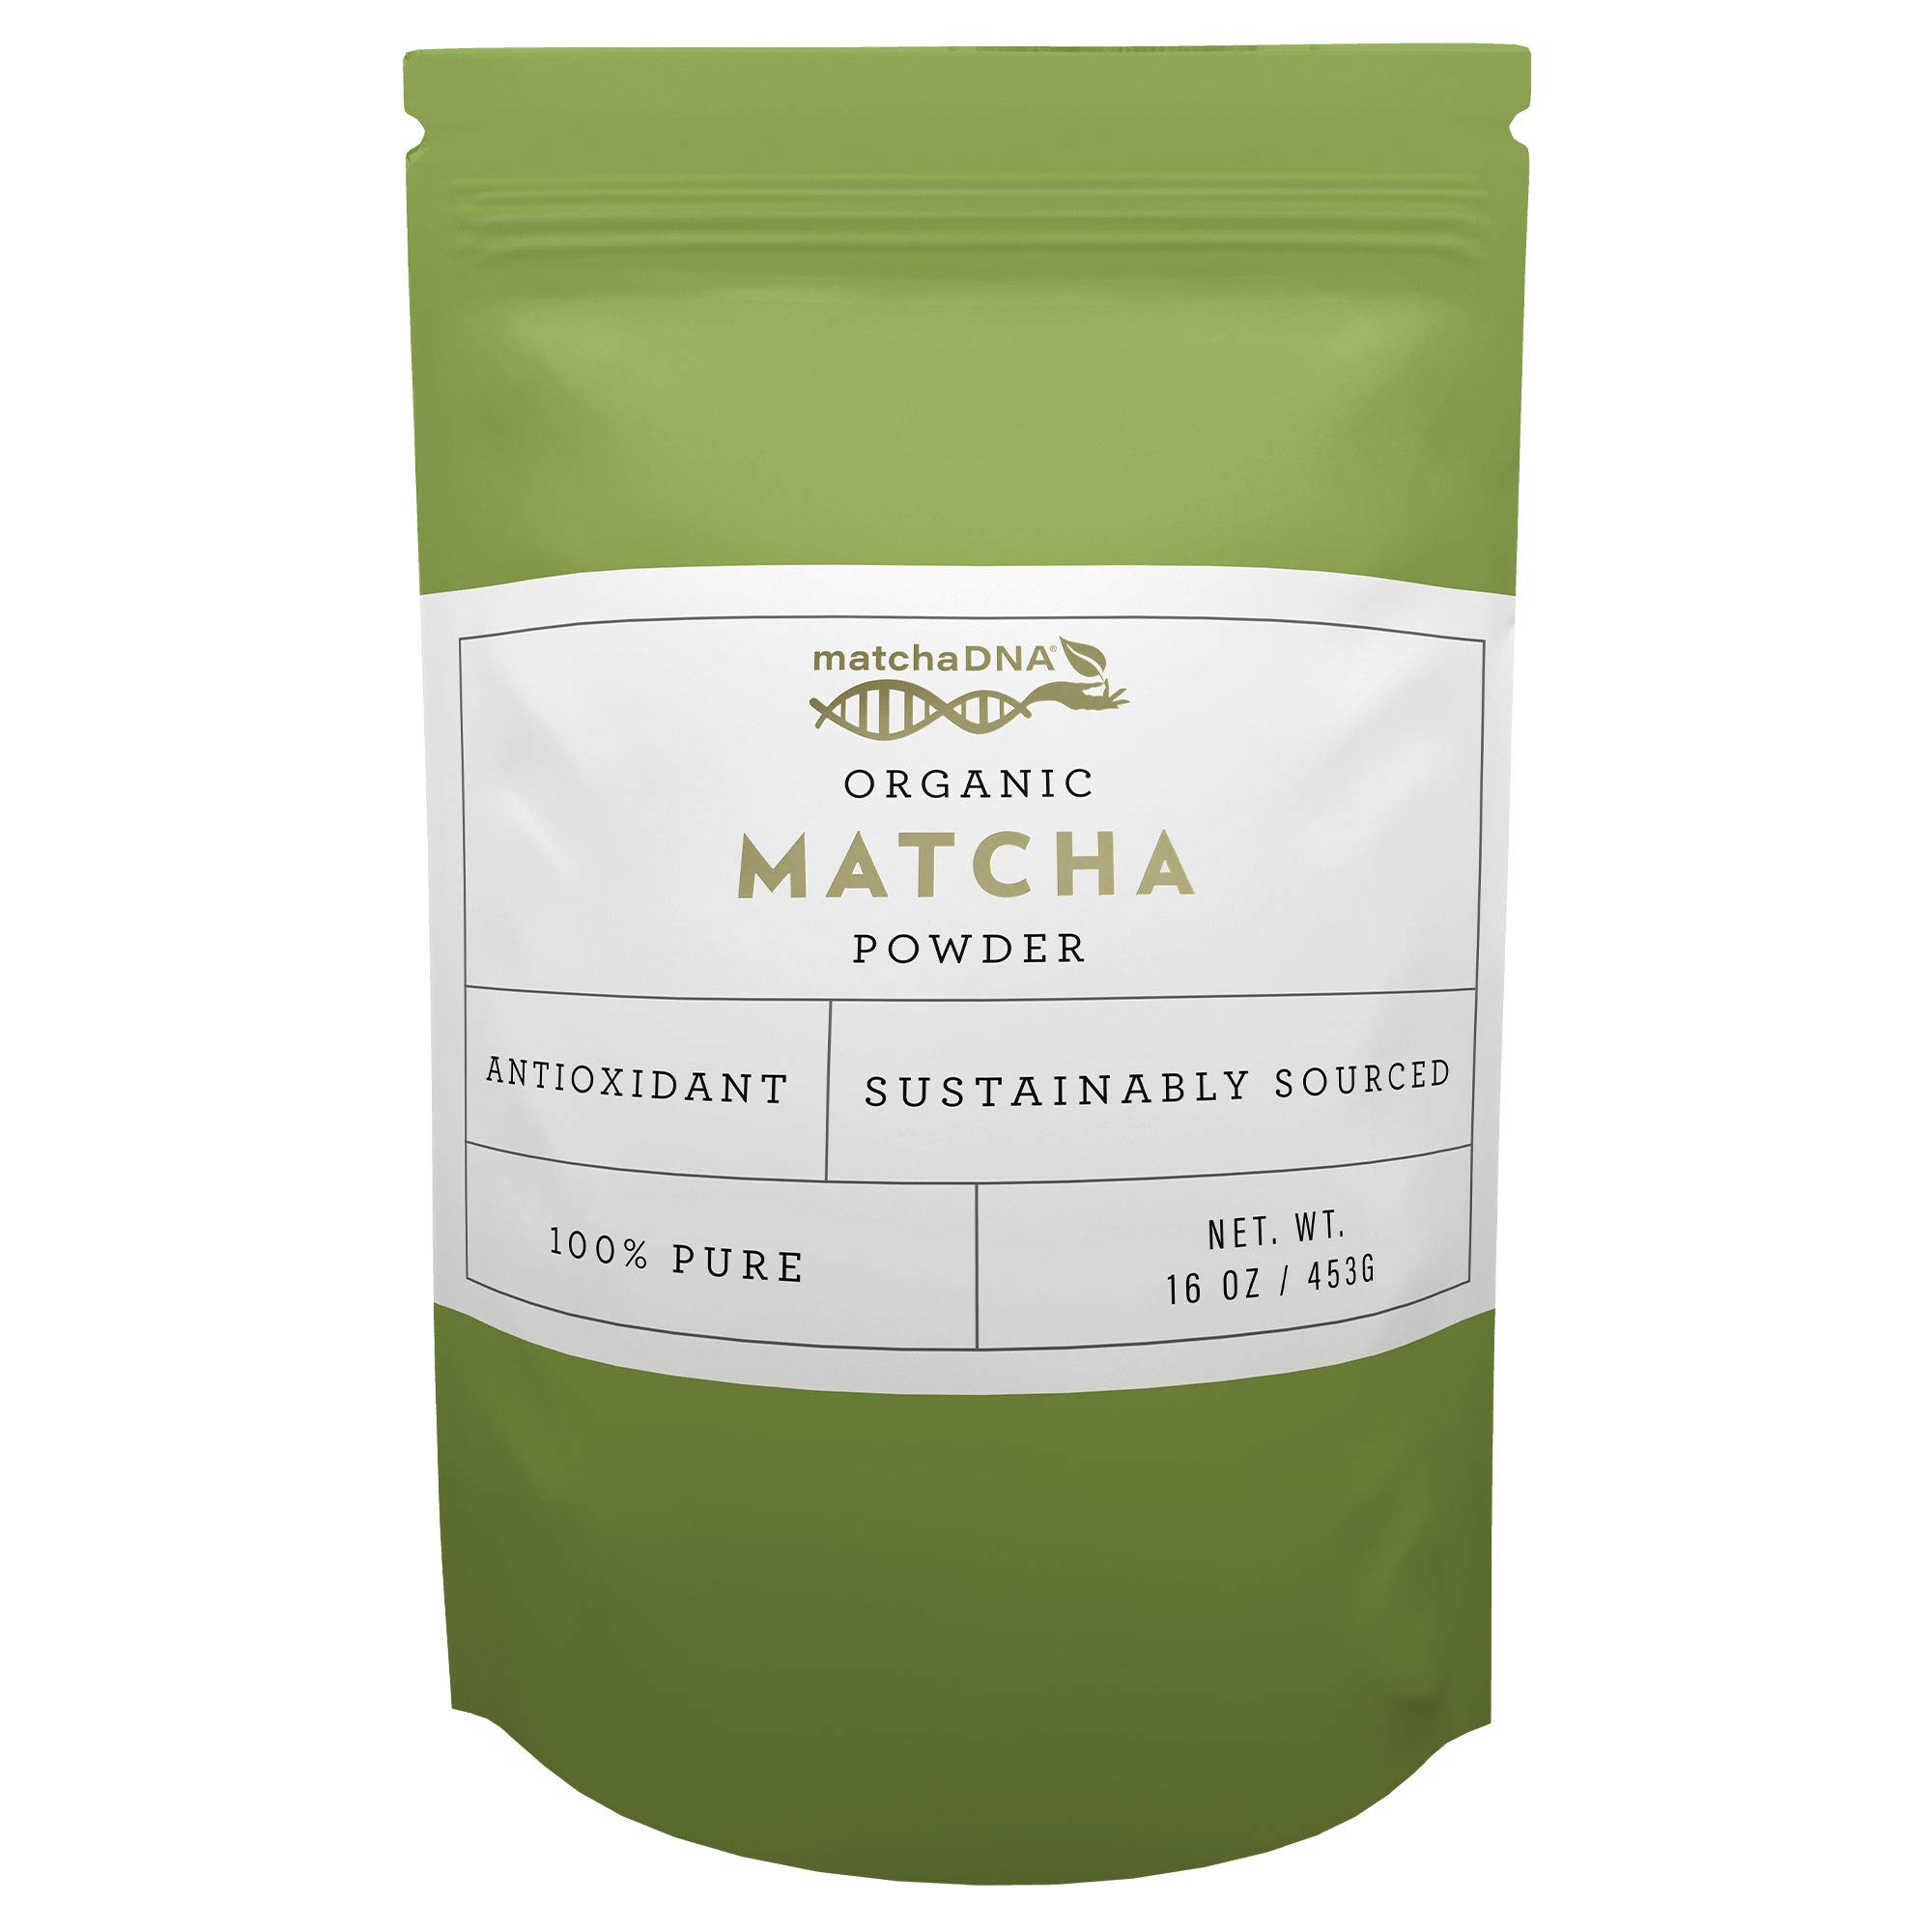 MatchaDNA USDA Organic Matcha Green Tea Powder Culinary Grade Powdered Matcha - High in antioxidants (16 Ounce)